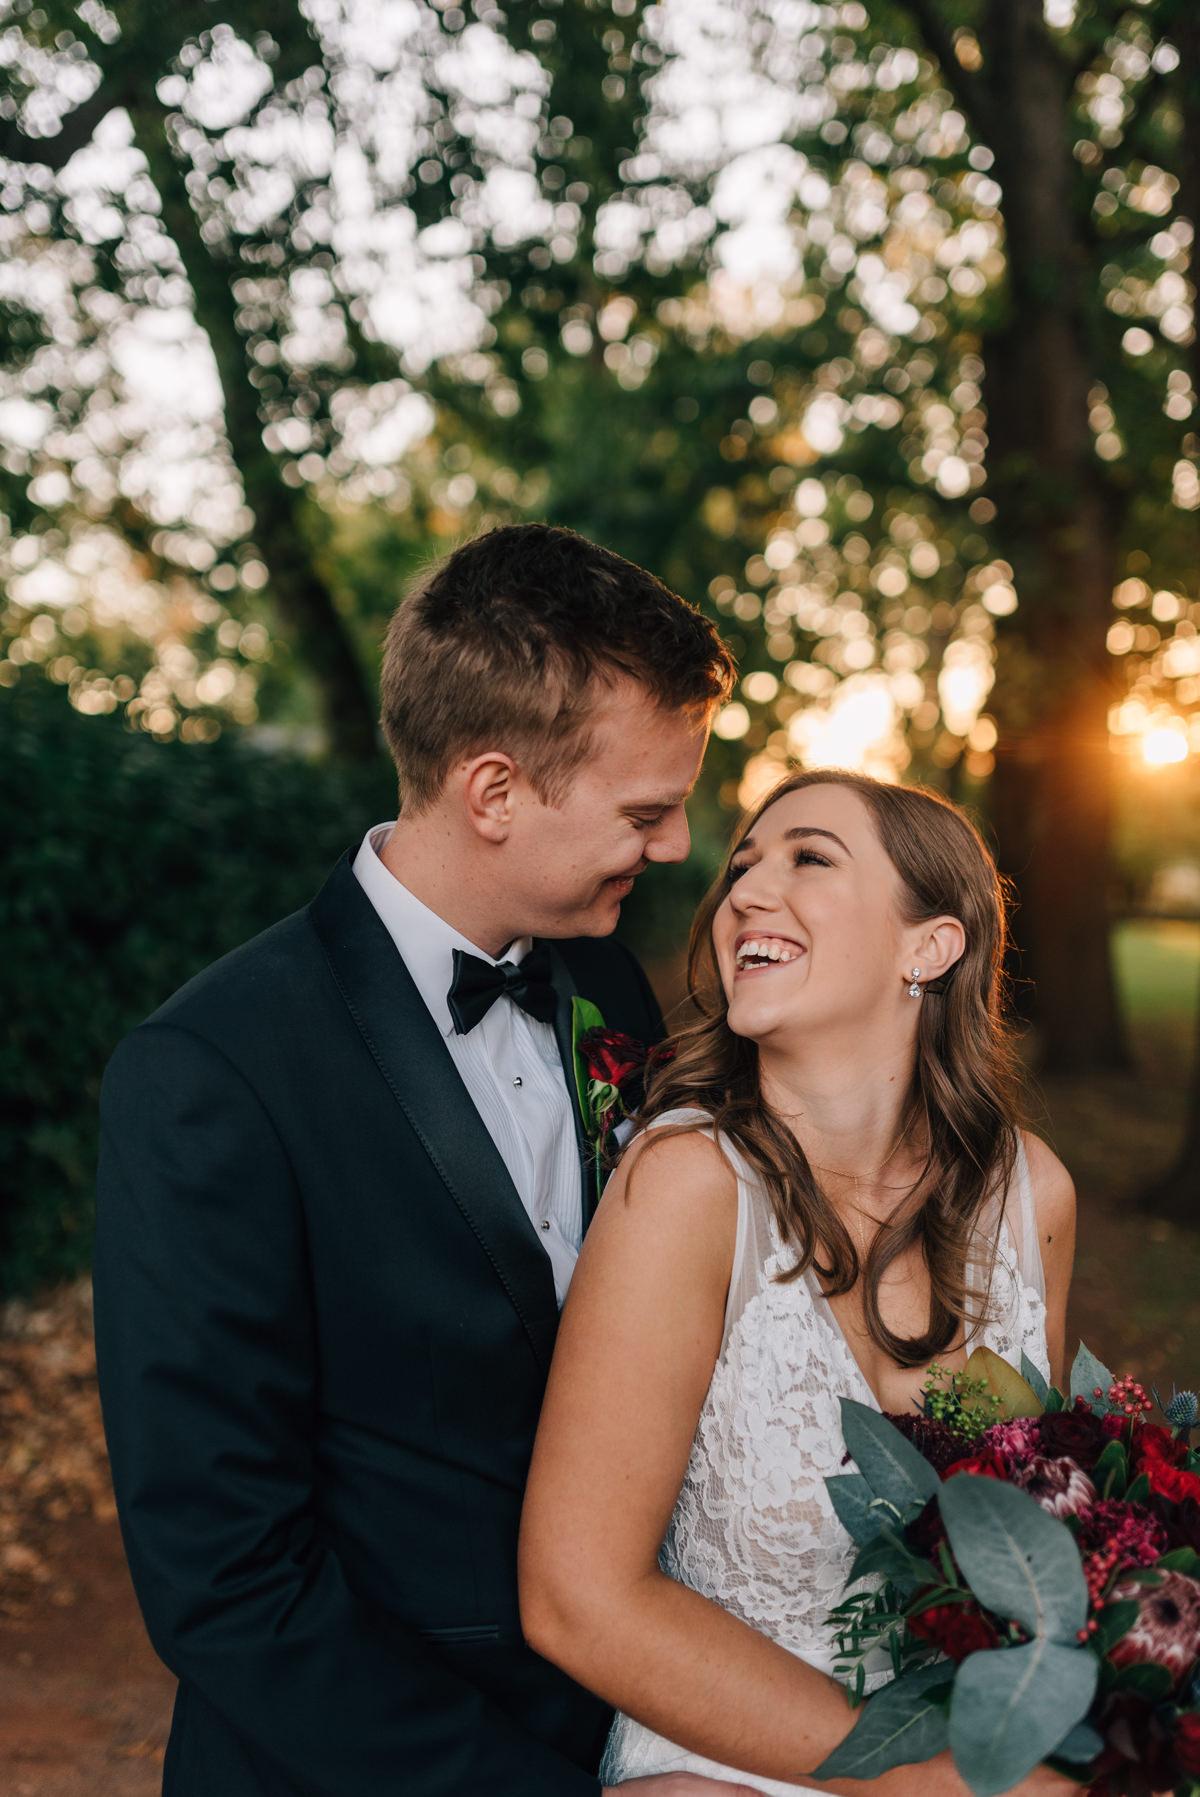 Wedding-Photohraphy-Launceston-Entally-59.jpg